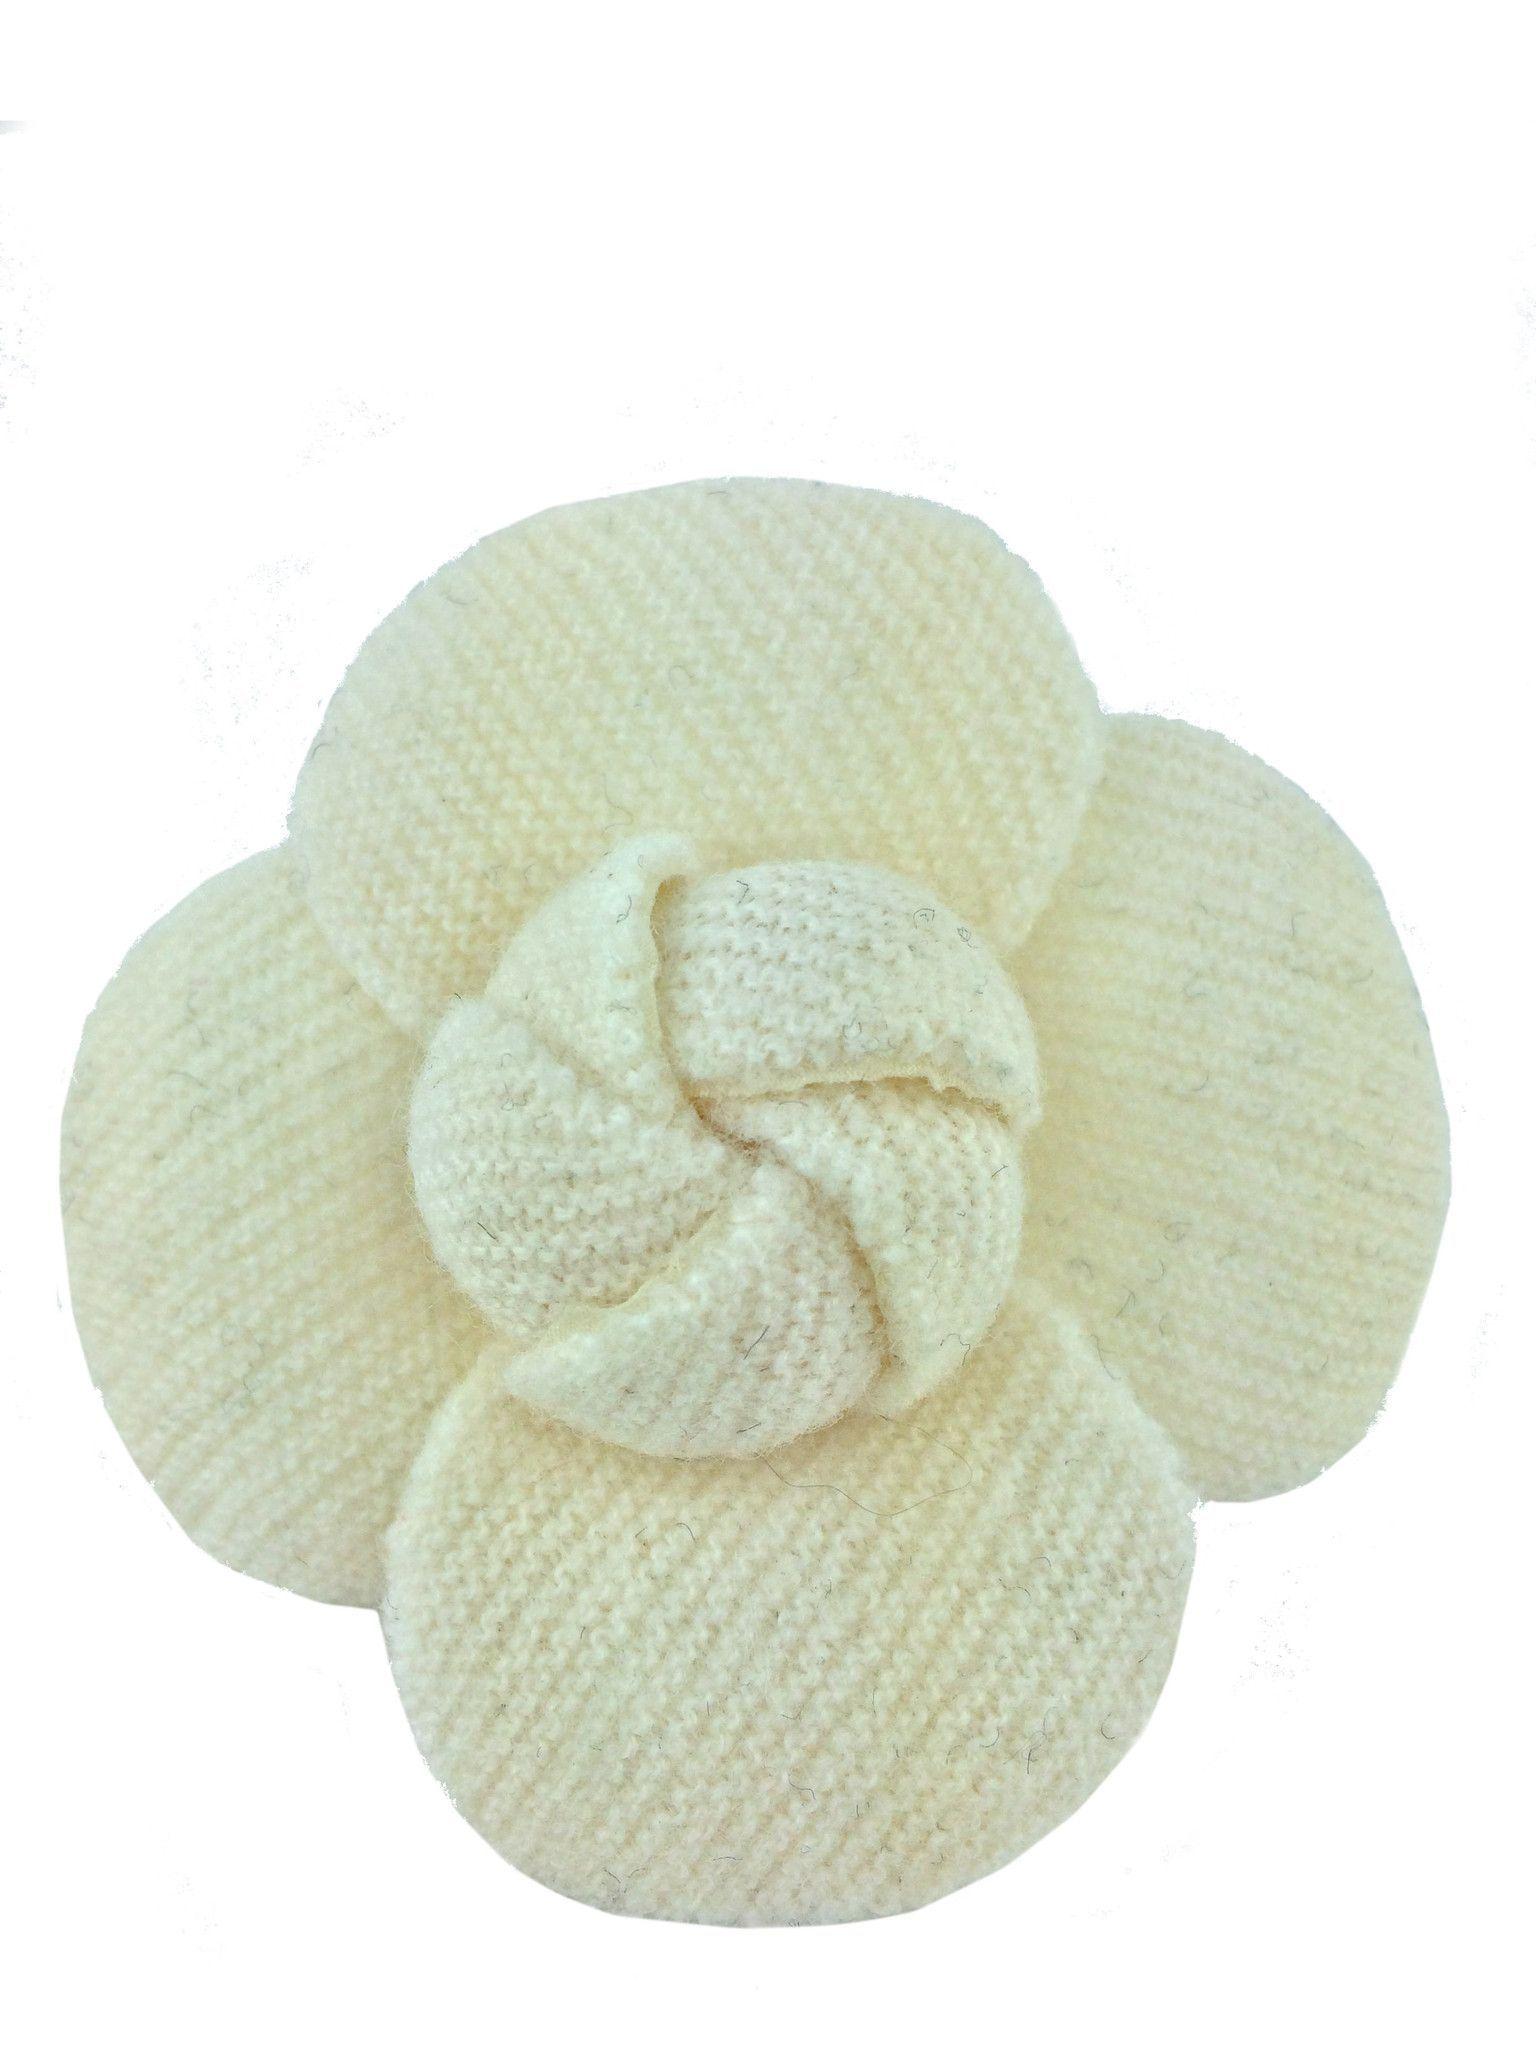 Chanel Tweed Camellia Flower Brooch Pin